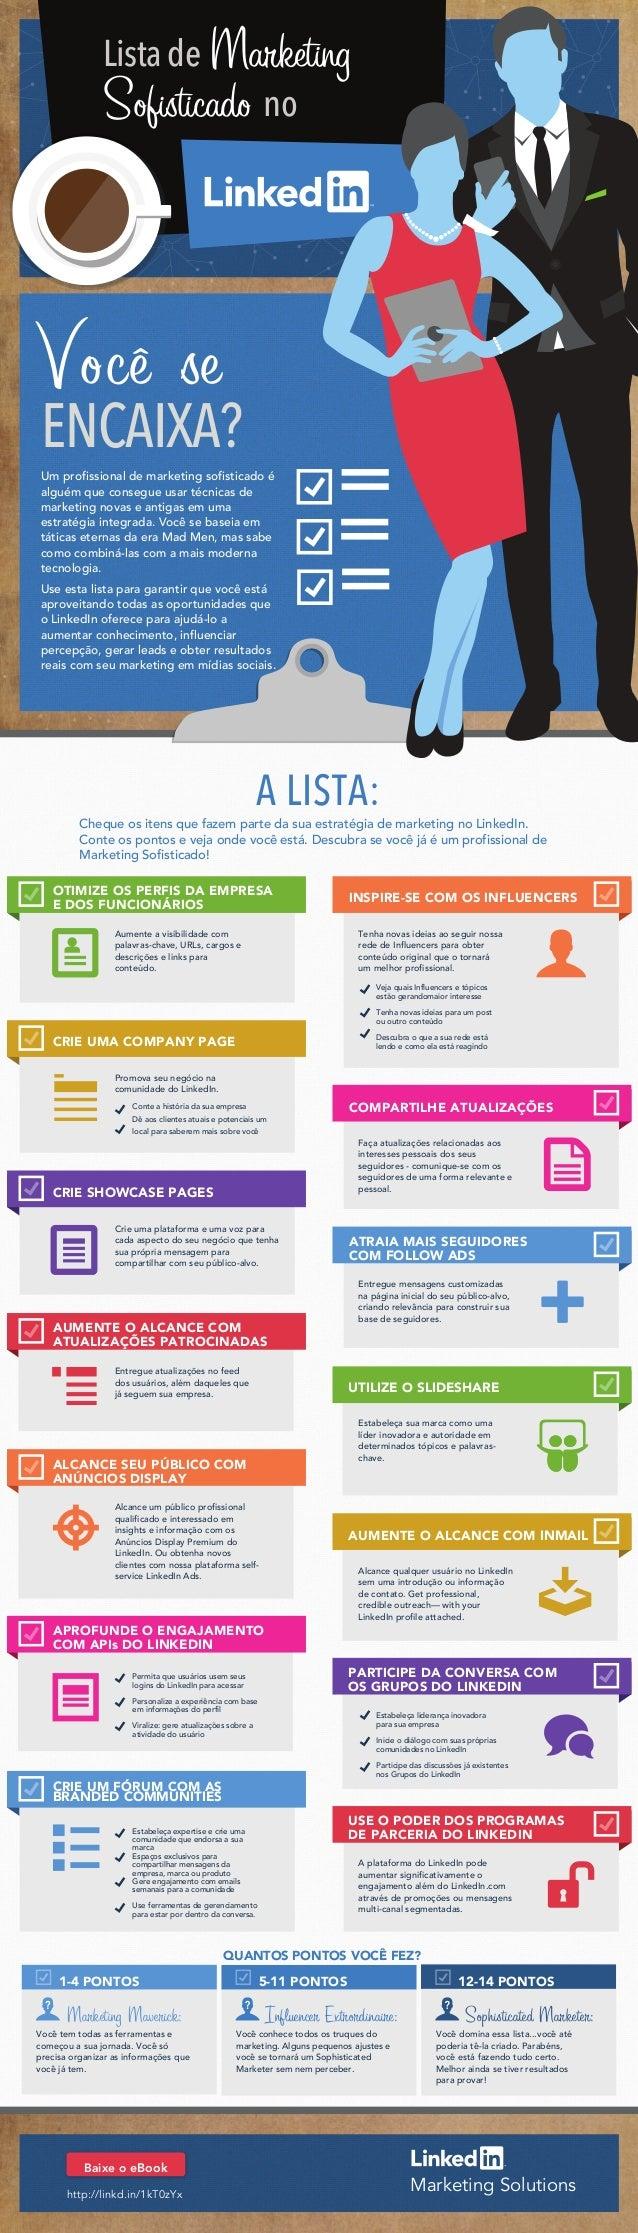 Marketing Sofisticado no LinkedIn - Infográfico